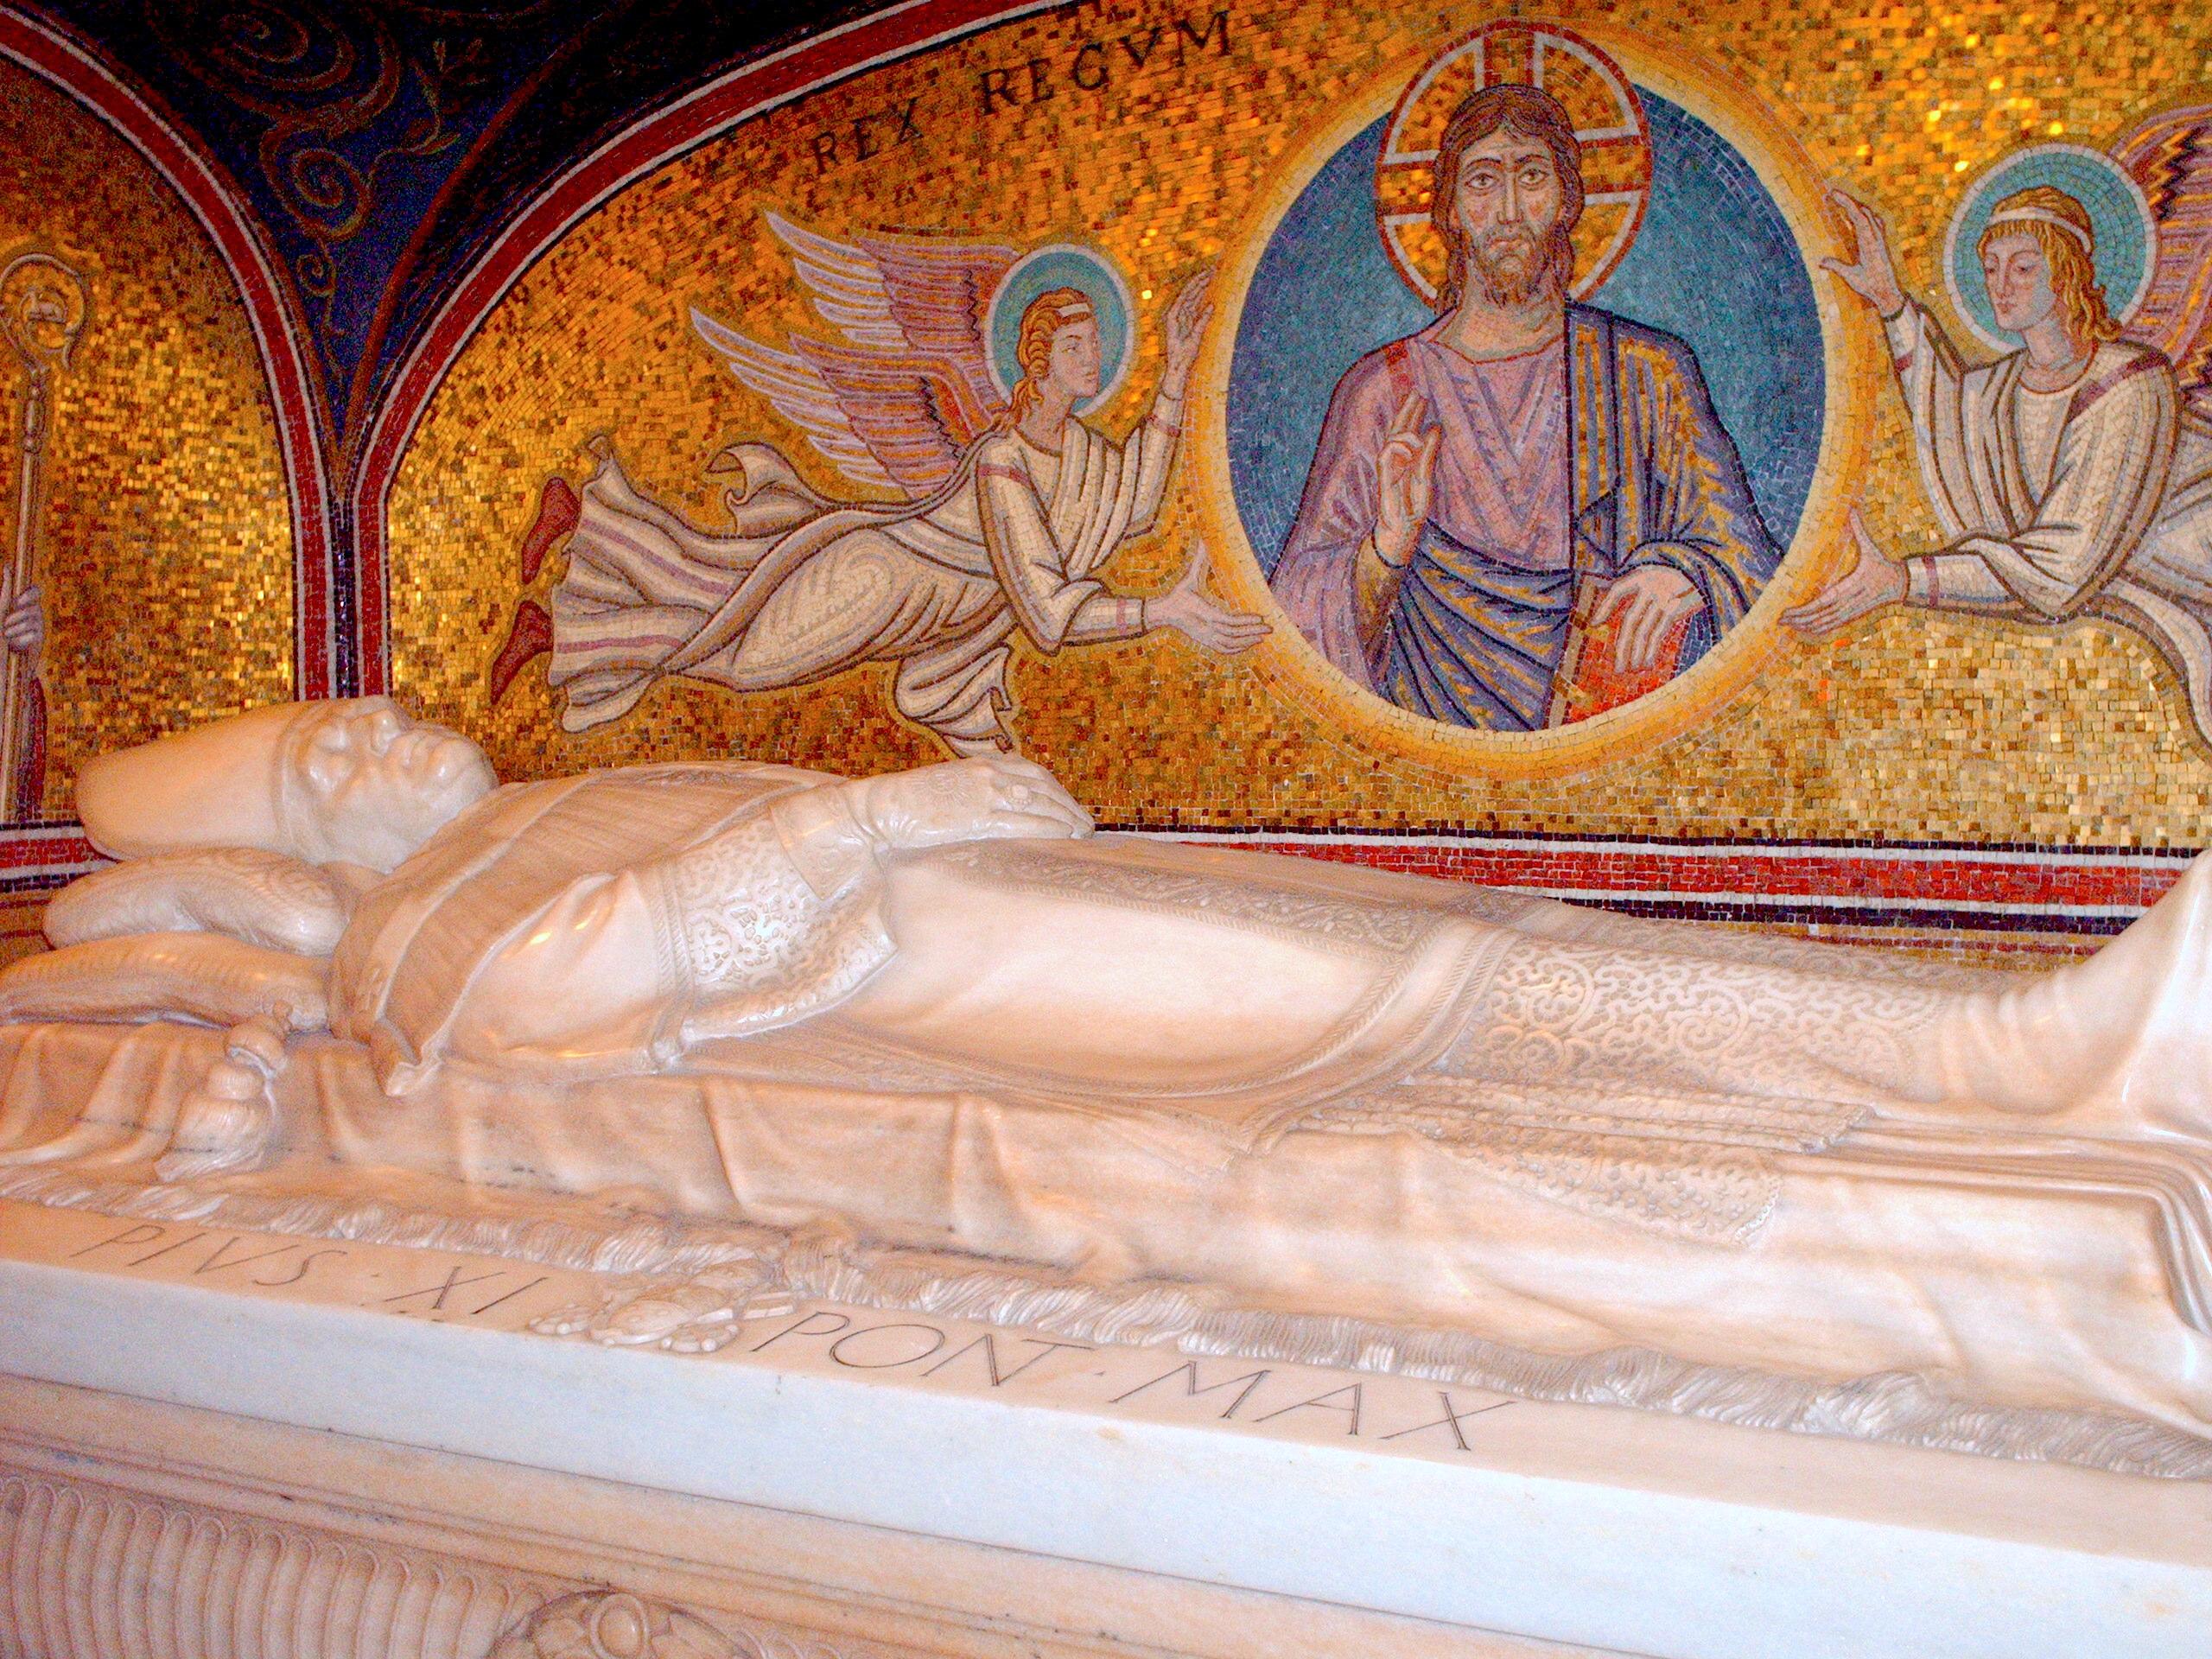 Vatican Grottoes - Tomb of Pio XI